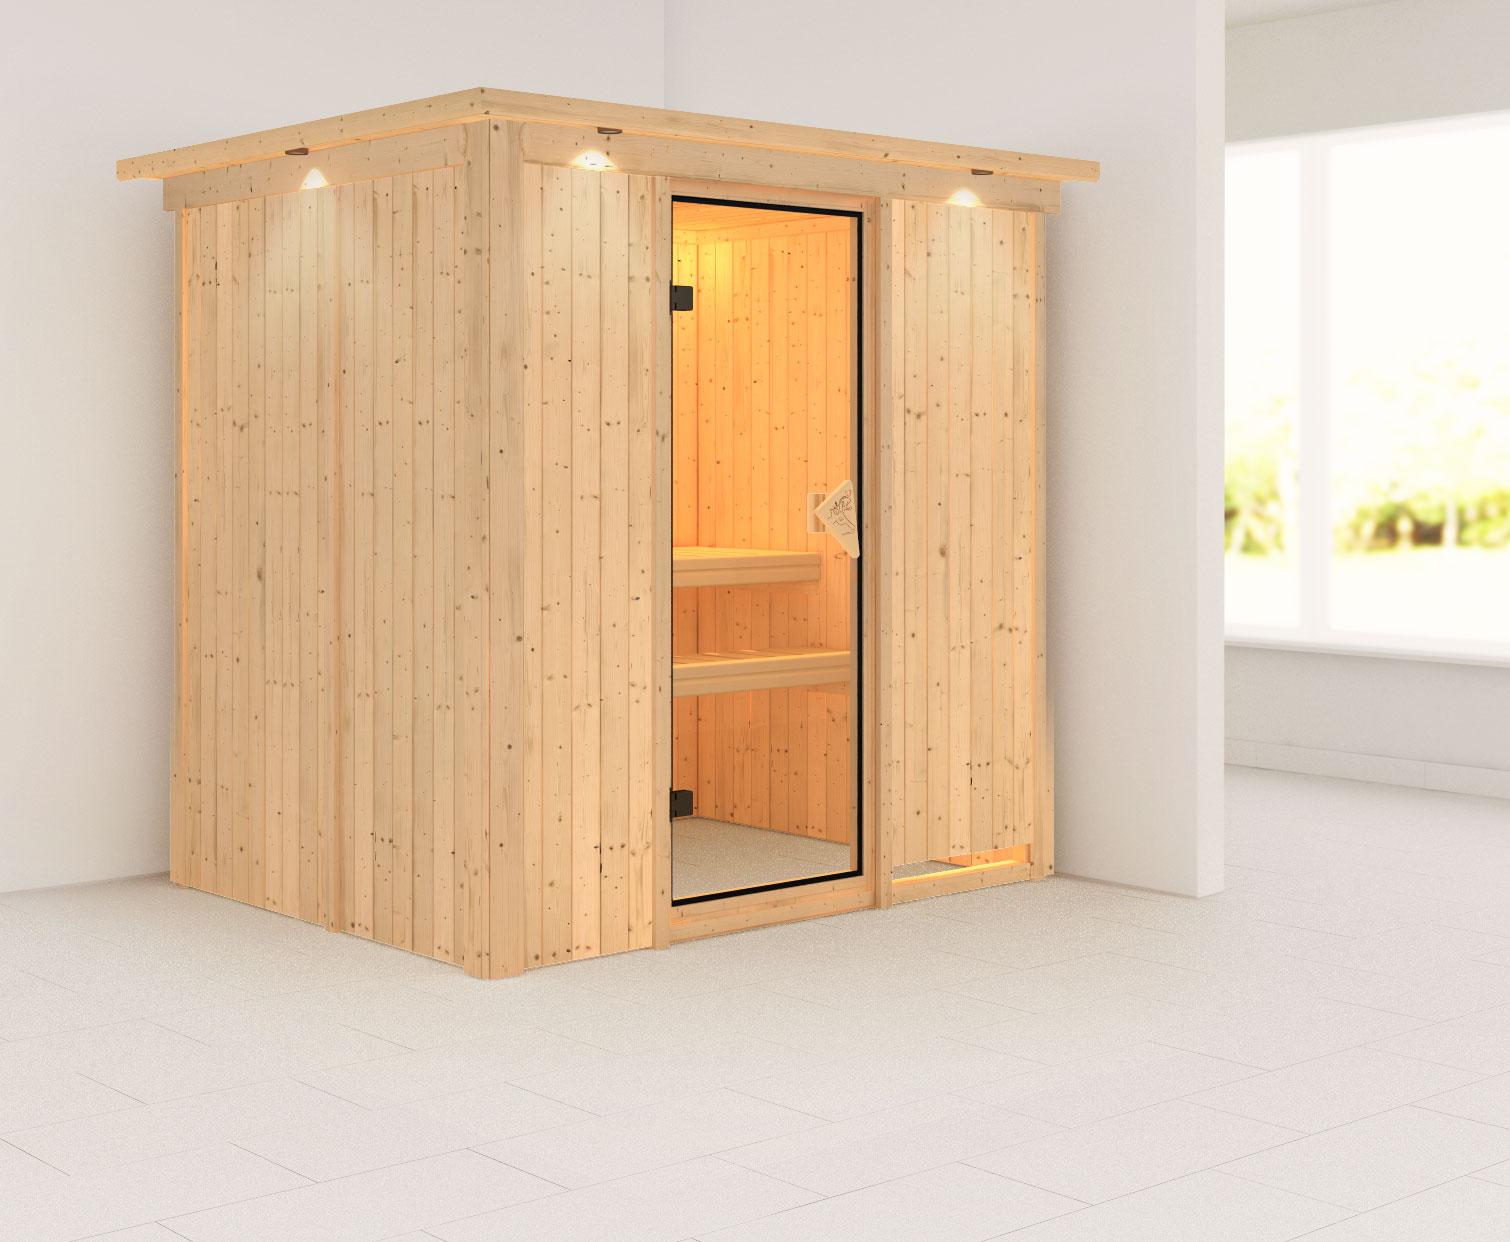 Karibu Sauna Bodin 68mm Dachkranz ohne Saunaofen classic Tür Bild 1